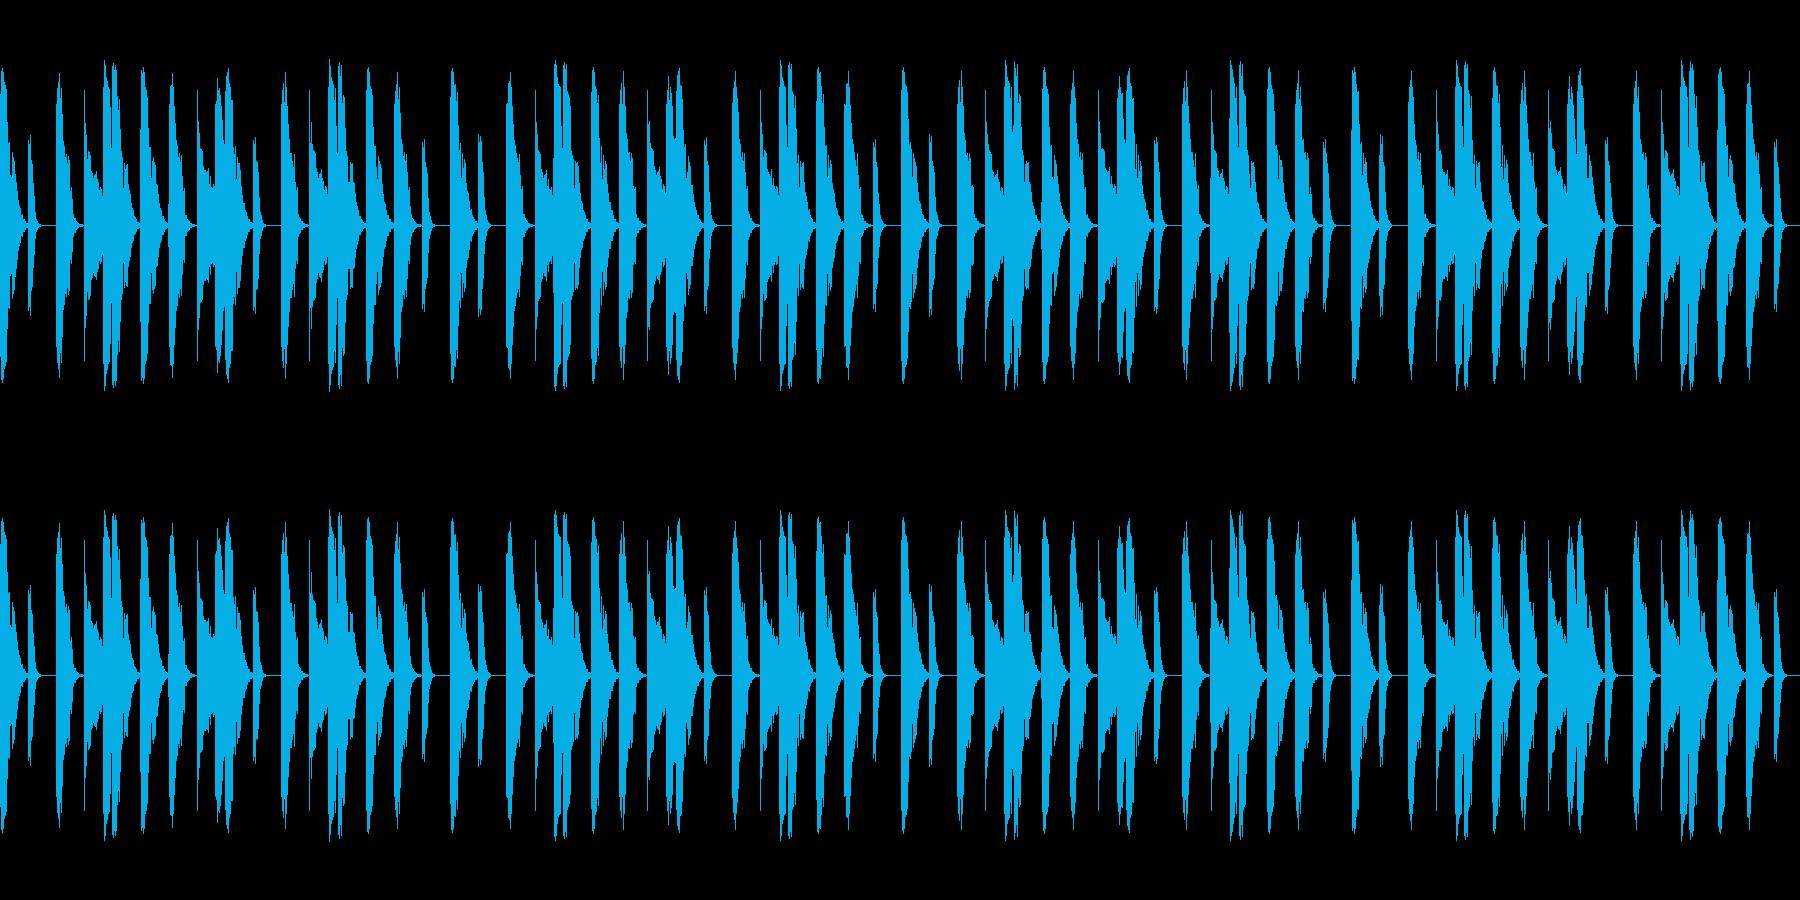 Boombap系ヒップホップビート8小節の再生済みの波形